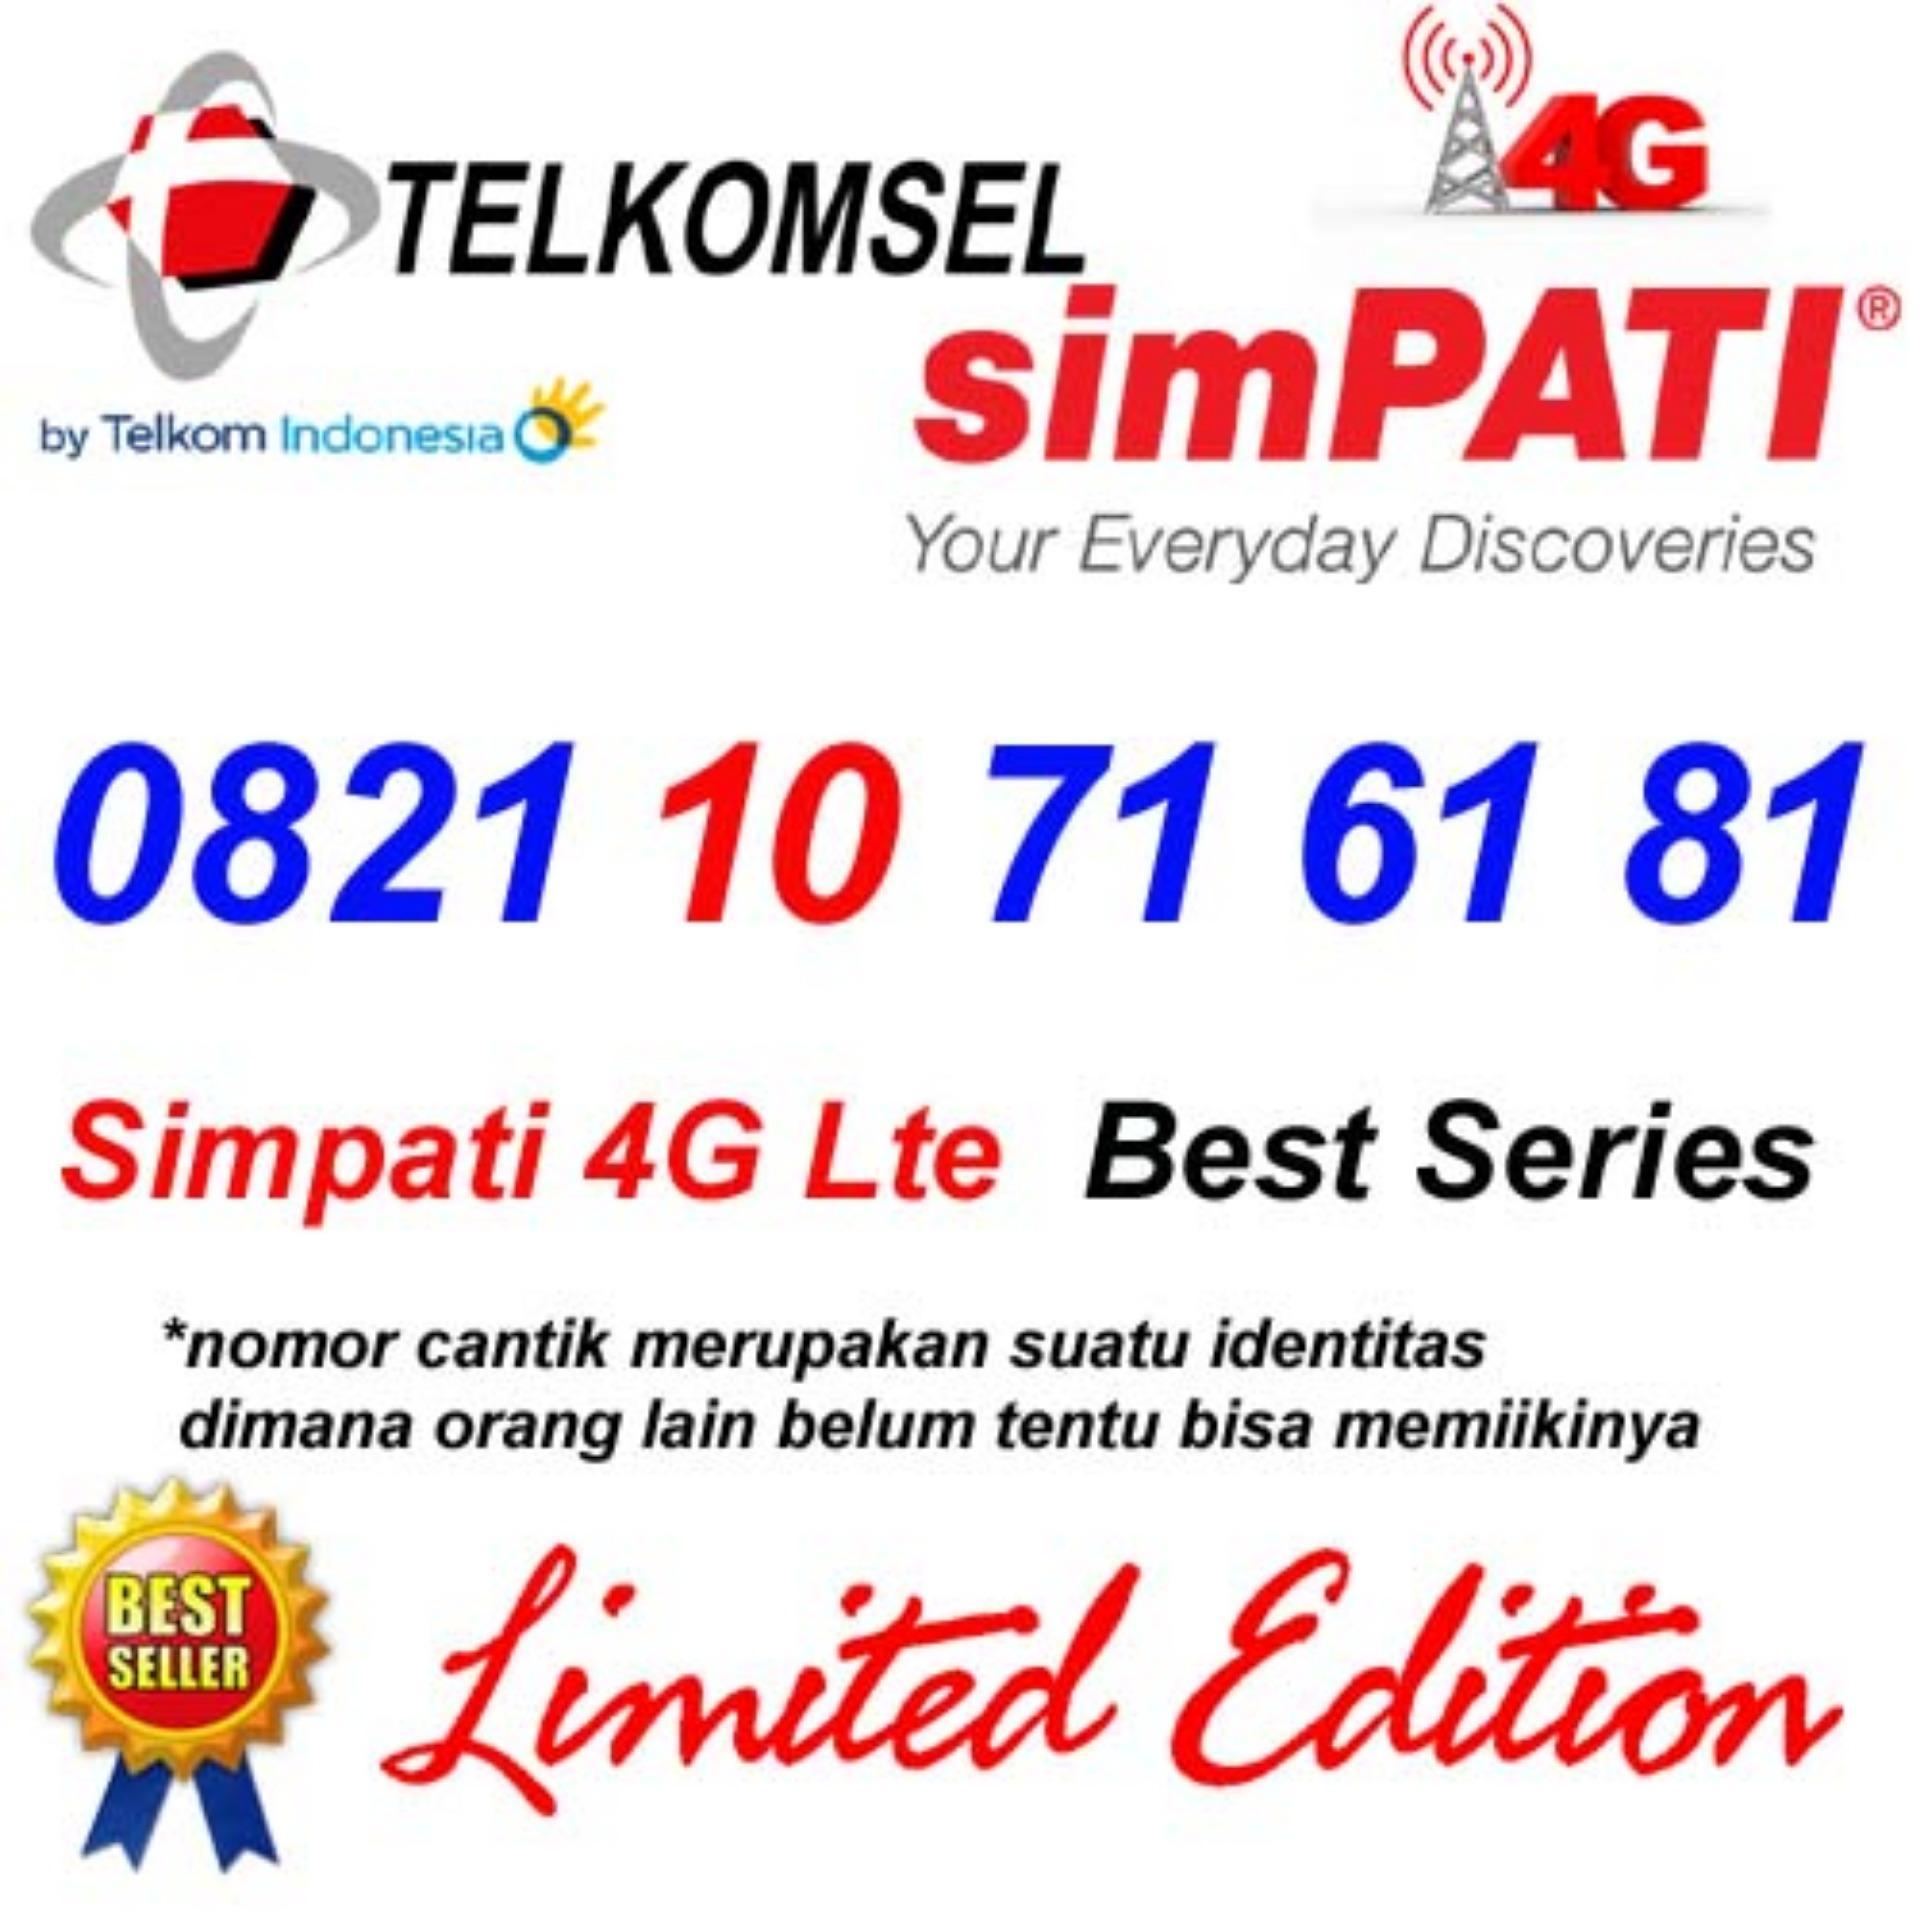 Telkomsel Simpati 4G Lte 0821 10 71 61 81 Kartu Perdana Nomor Cantik super